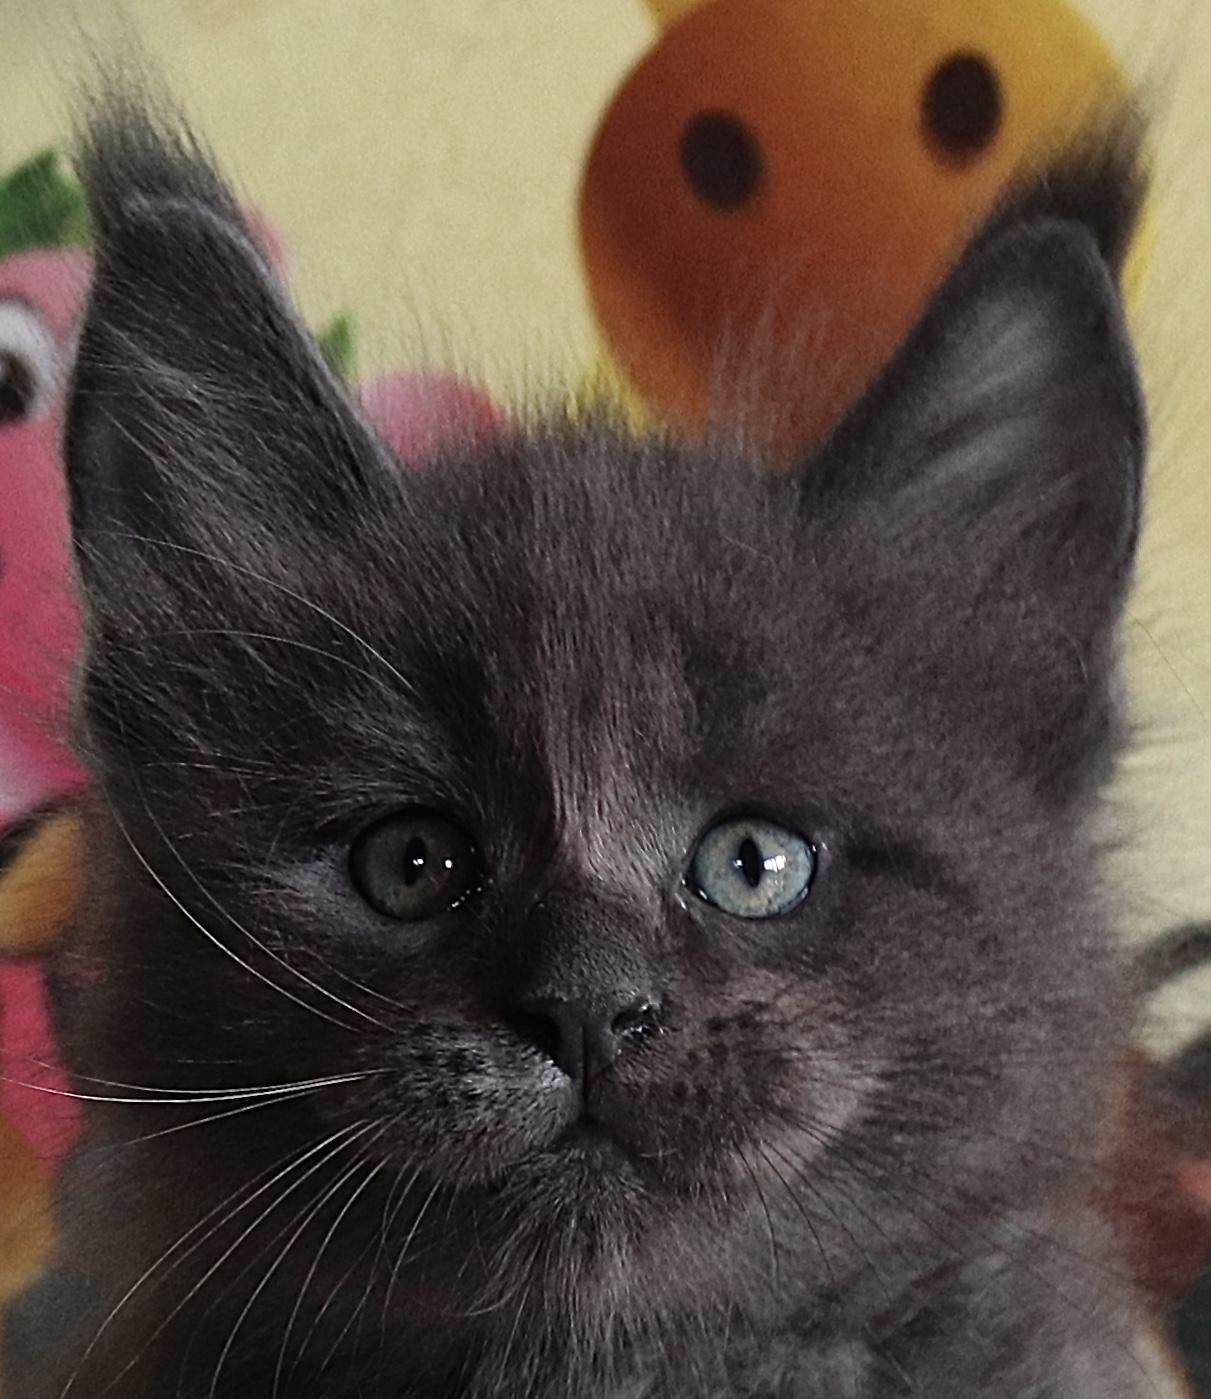 fotka kočky ORLANDO GRAND VON ERILLIAN,CZ, male